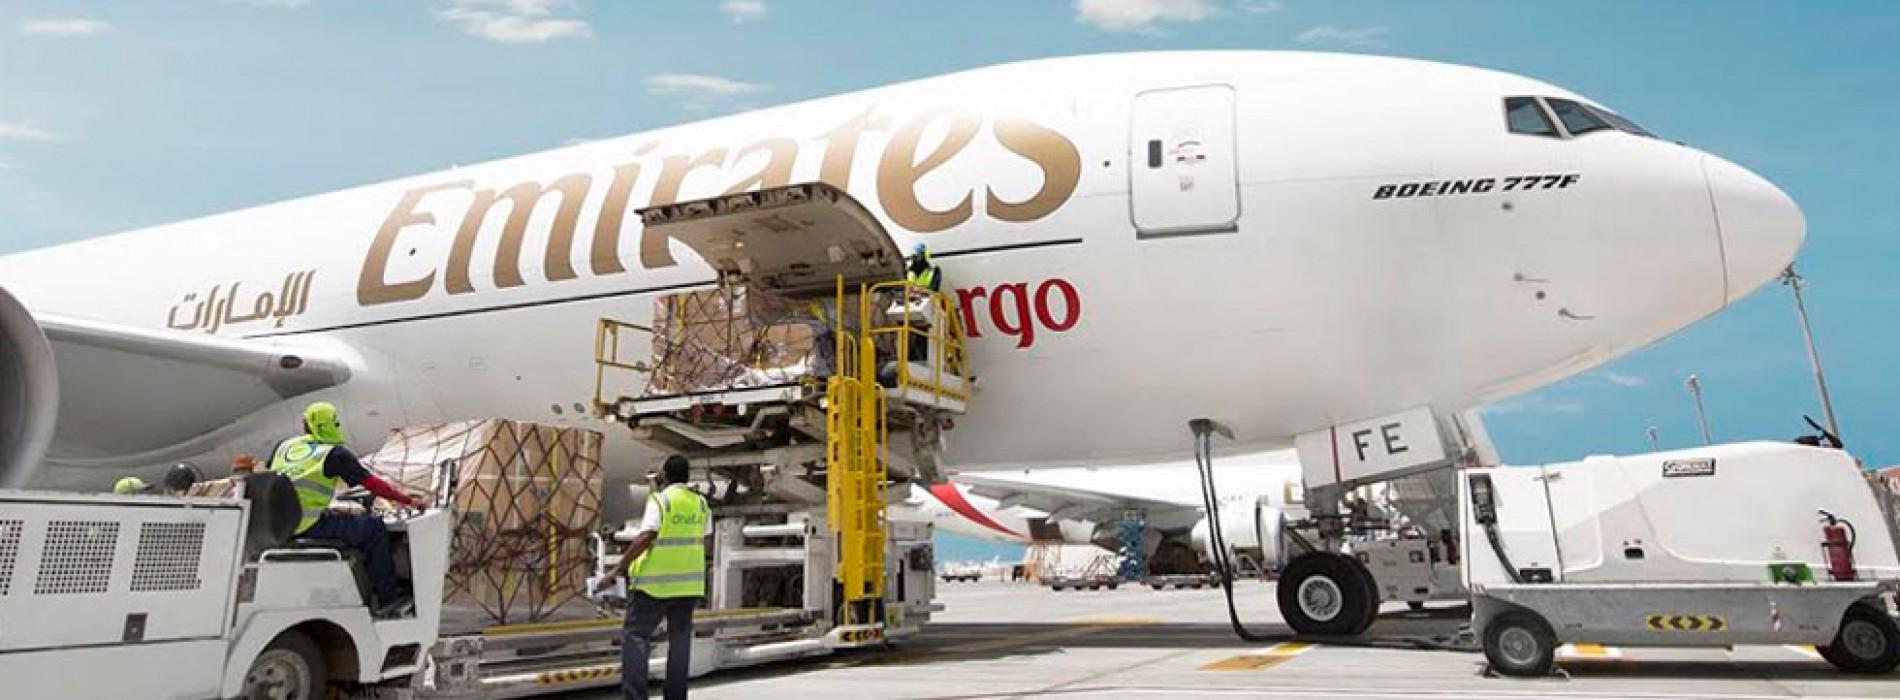 Emirates SkyCargo launches new Hong Kong-Delhi freighter service